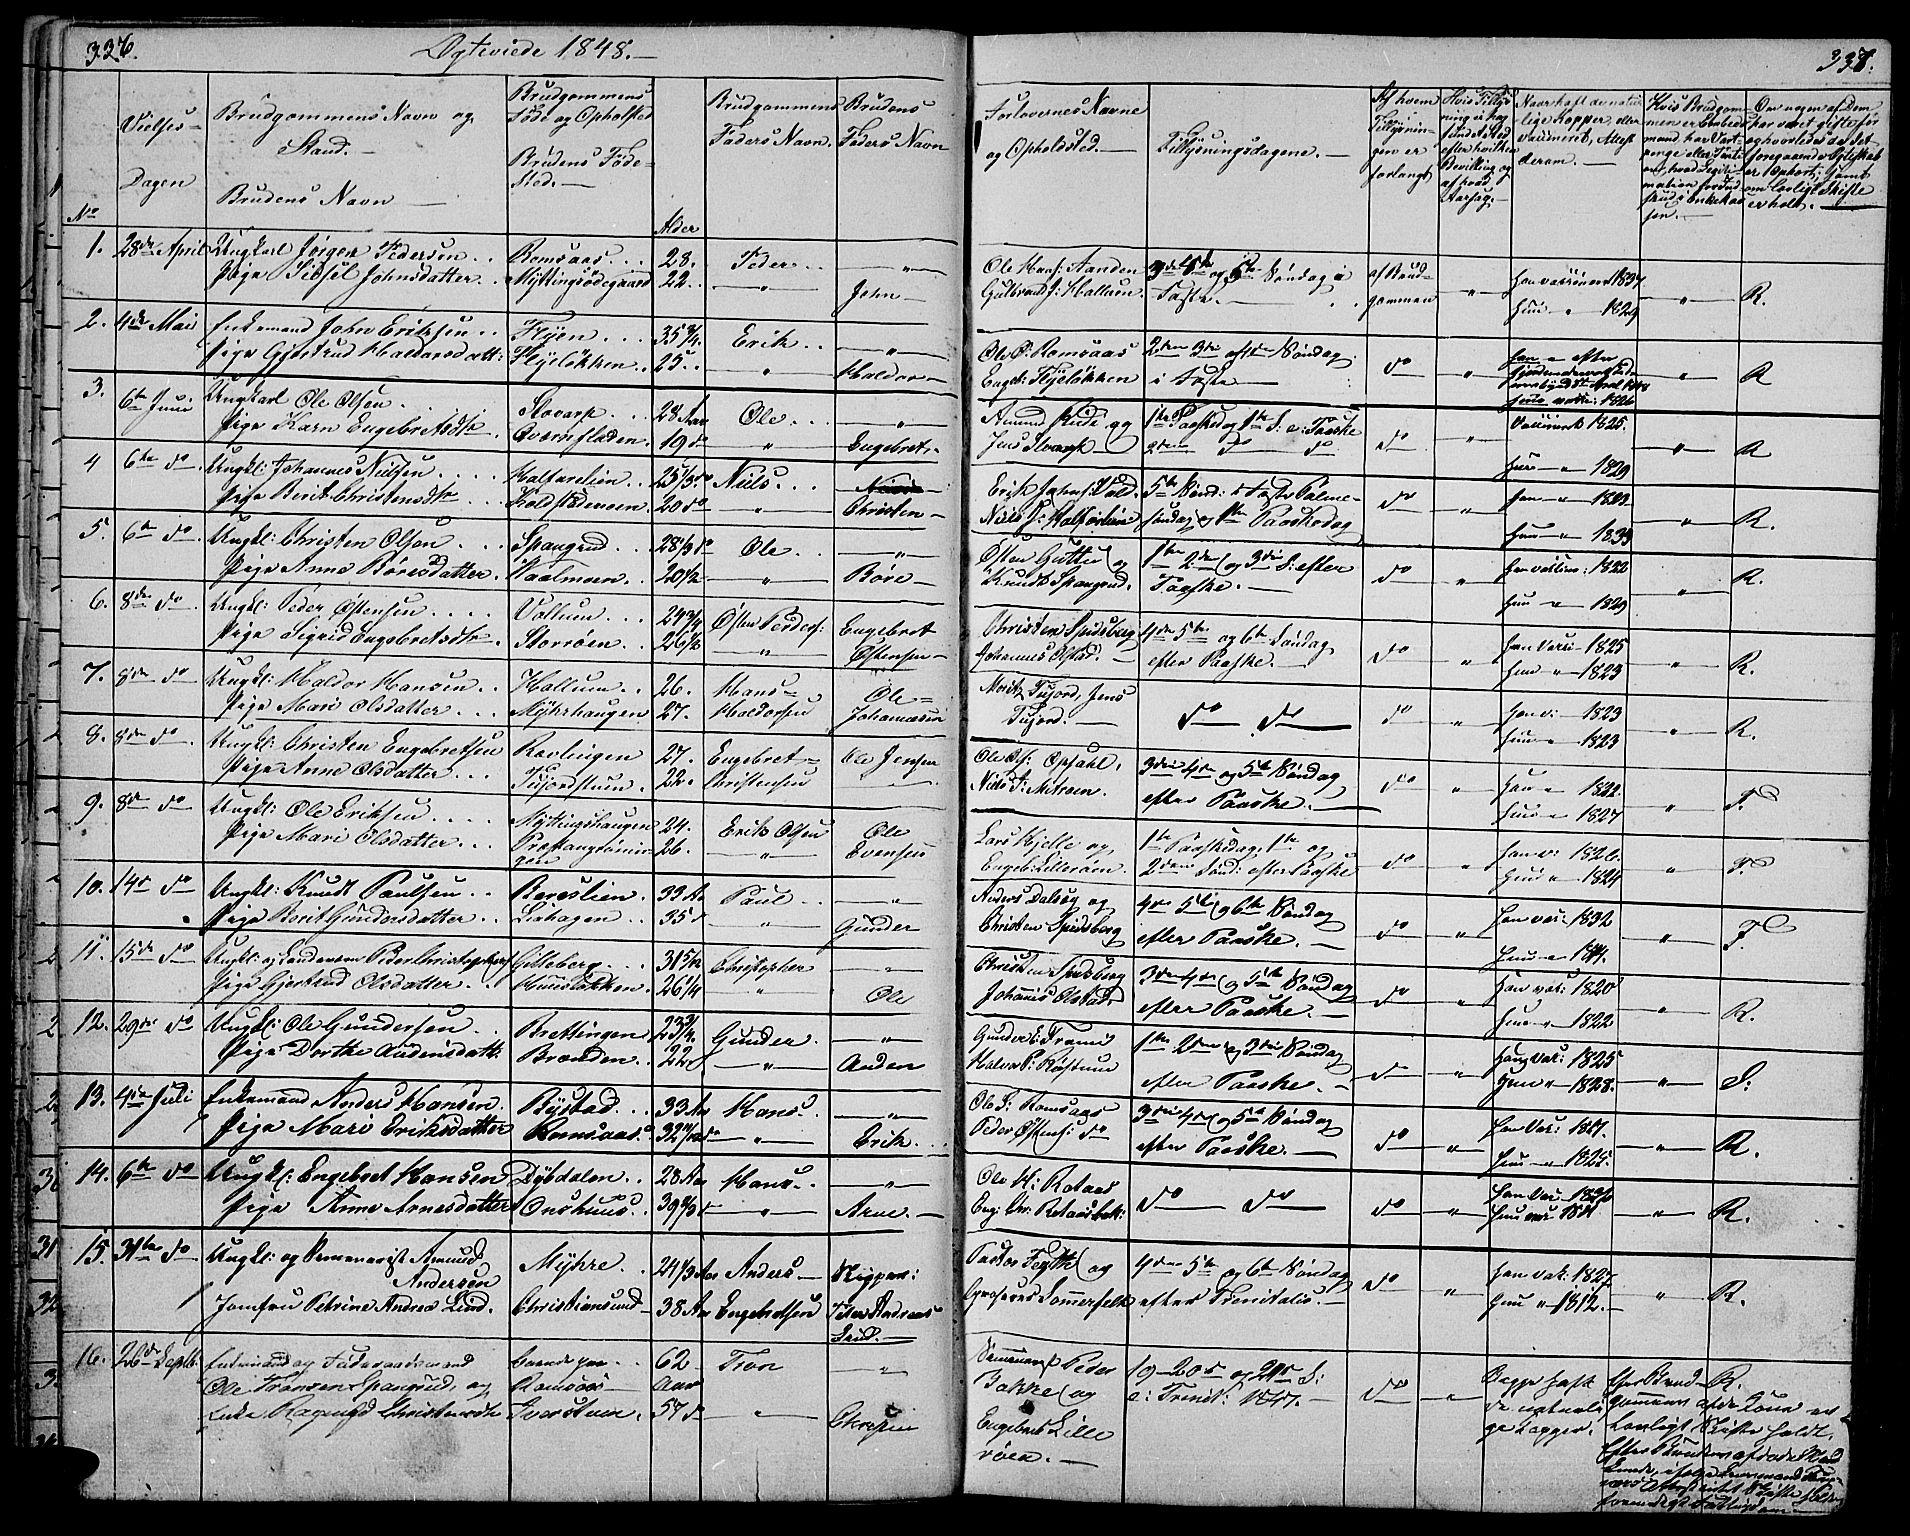 SAH, Ringebu prestekontor, Klokkerbok nr. 2, 1839-1853, s. 336-337